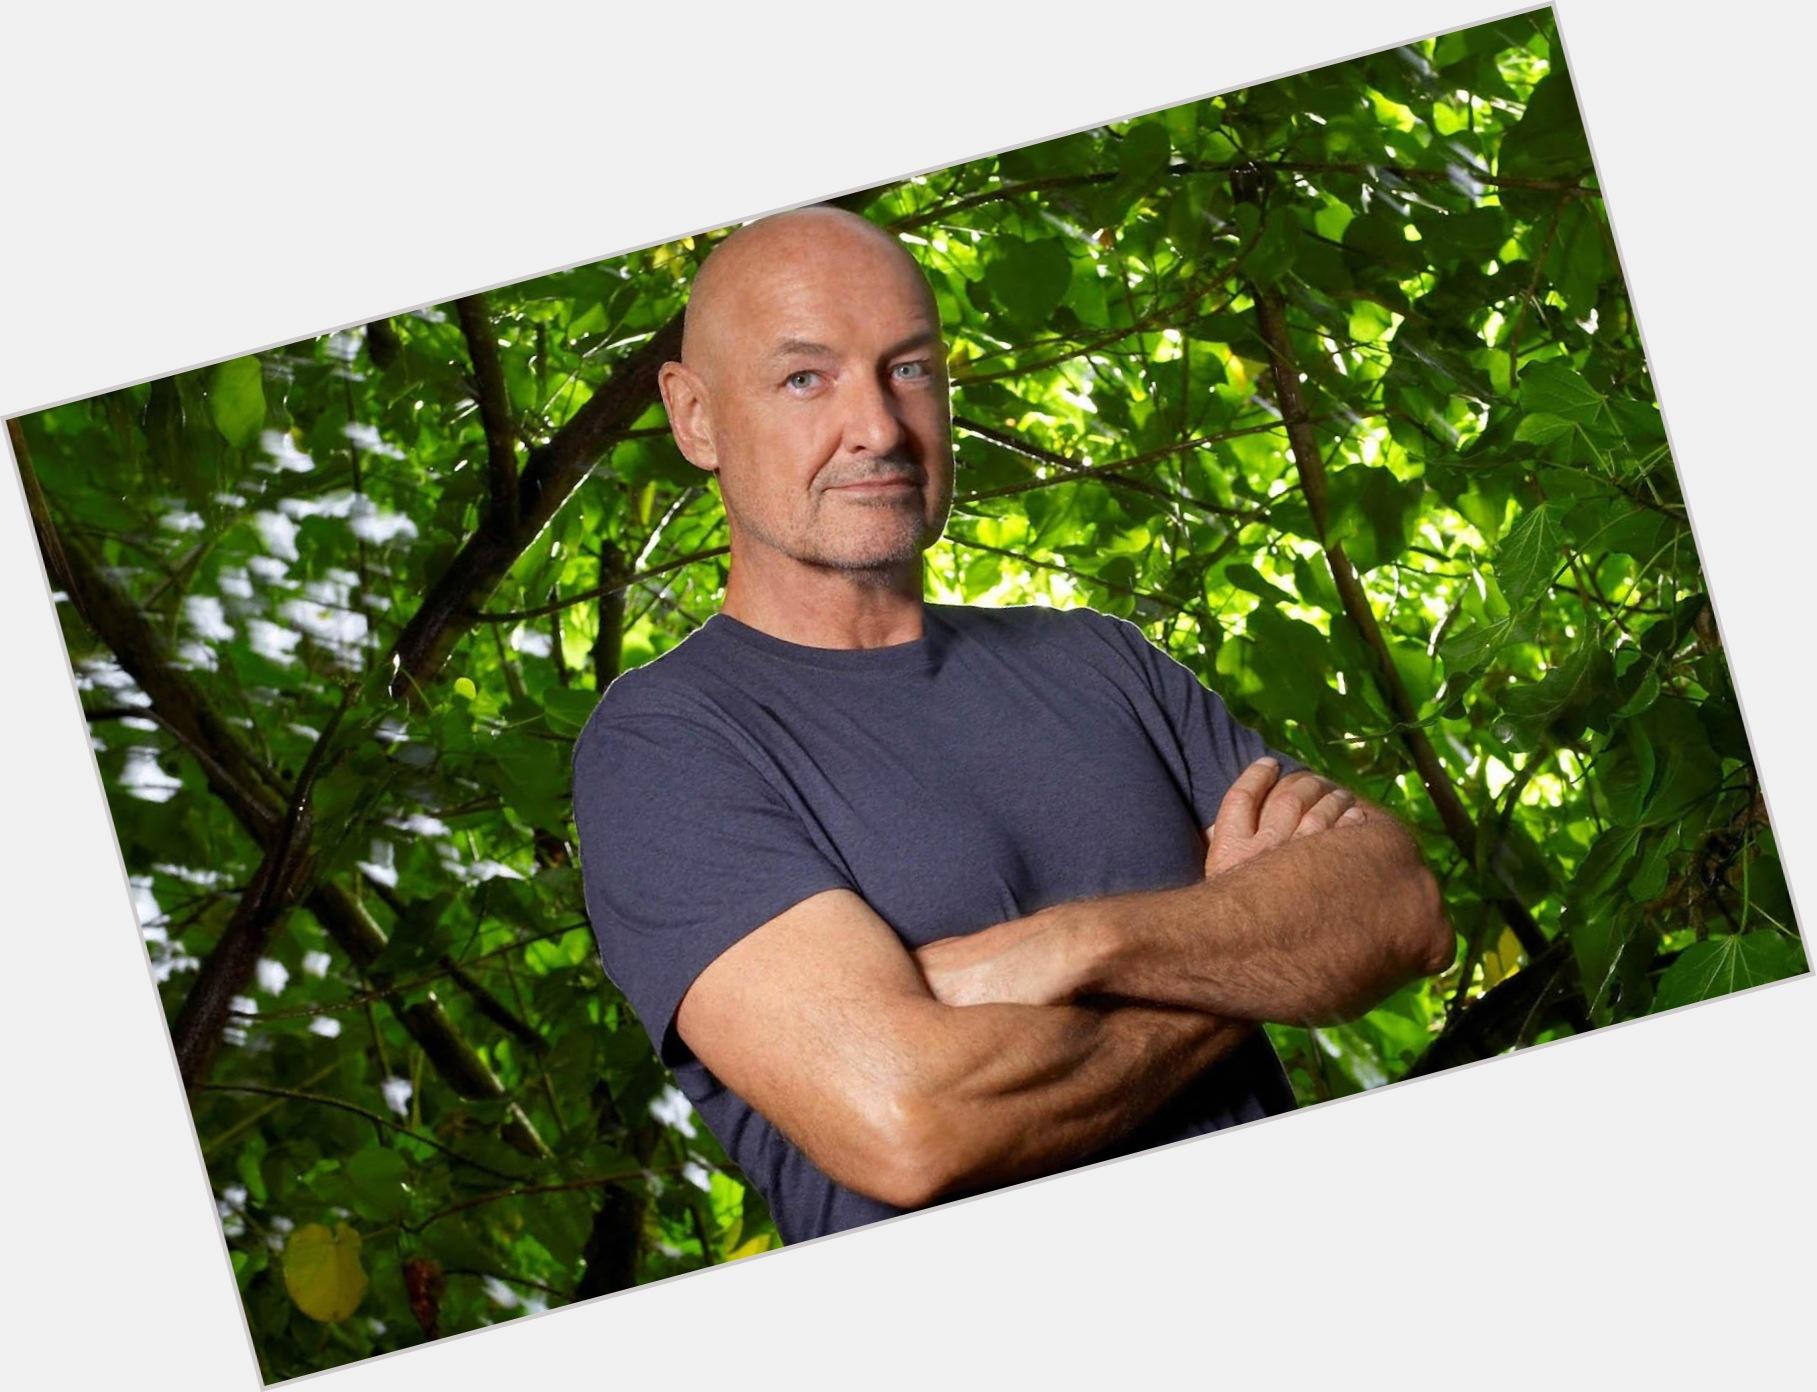 John Locke dating 4.jpg